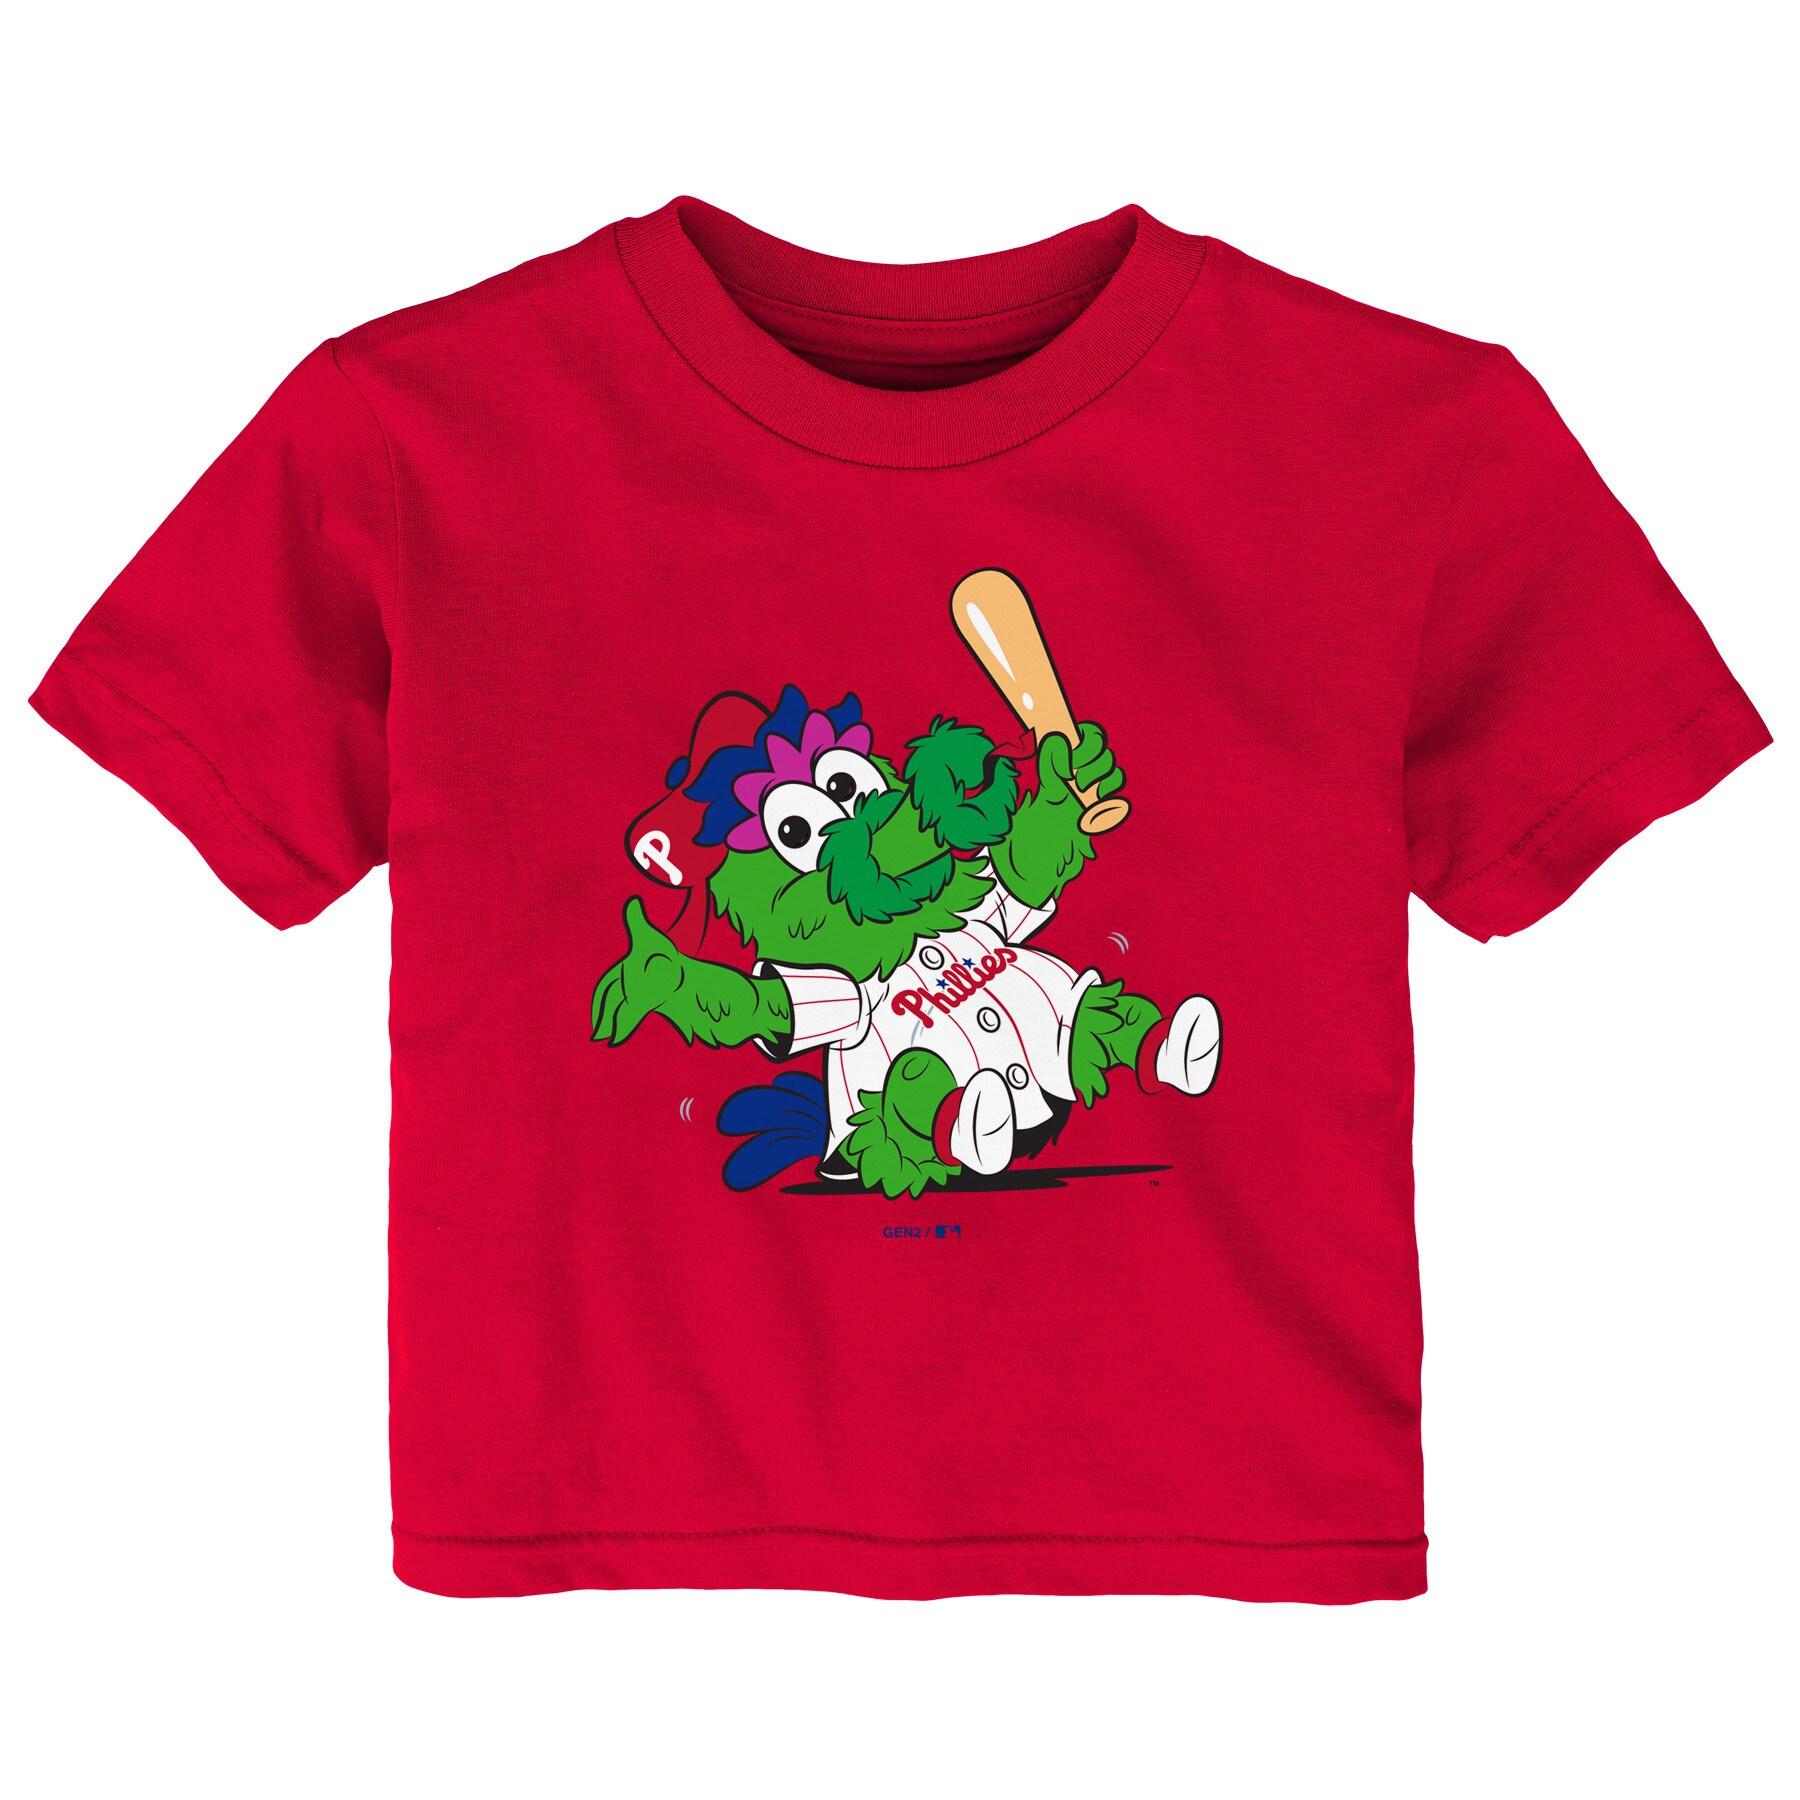 Philadelphia Phillies Infant Baby Mascot T-Shirt - Red